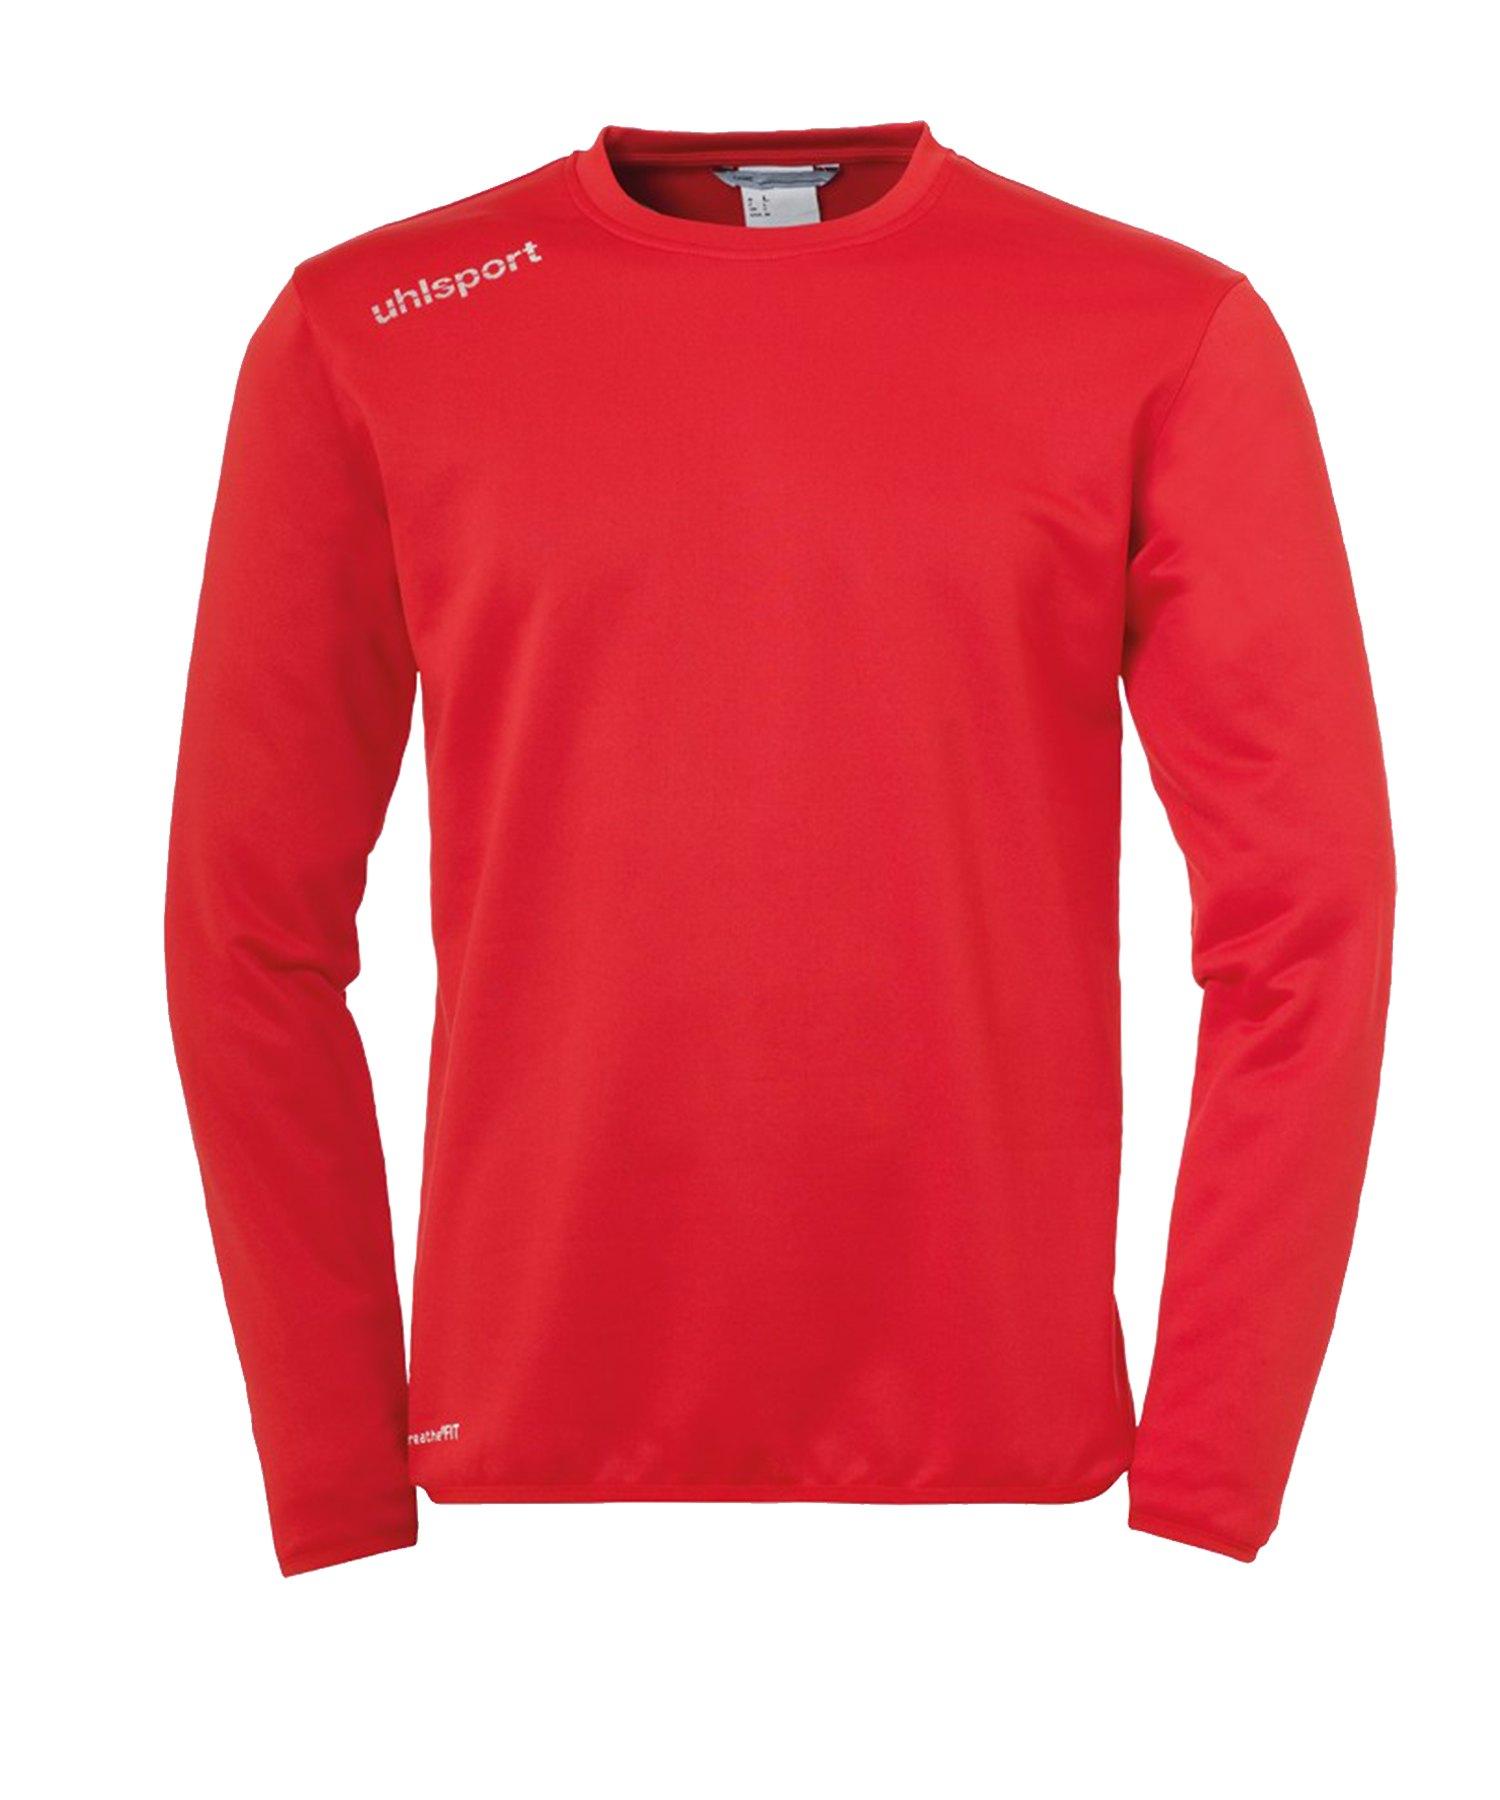 Uhlsport Essential Trainingstop langarm Rot F04 - rot